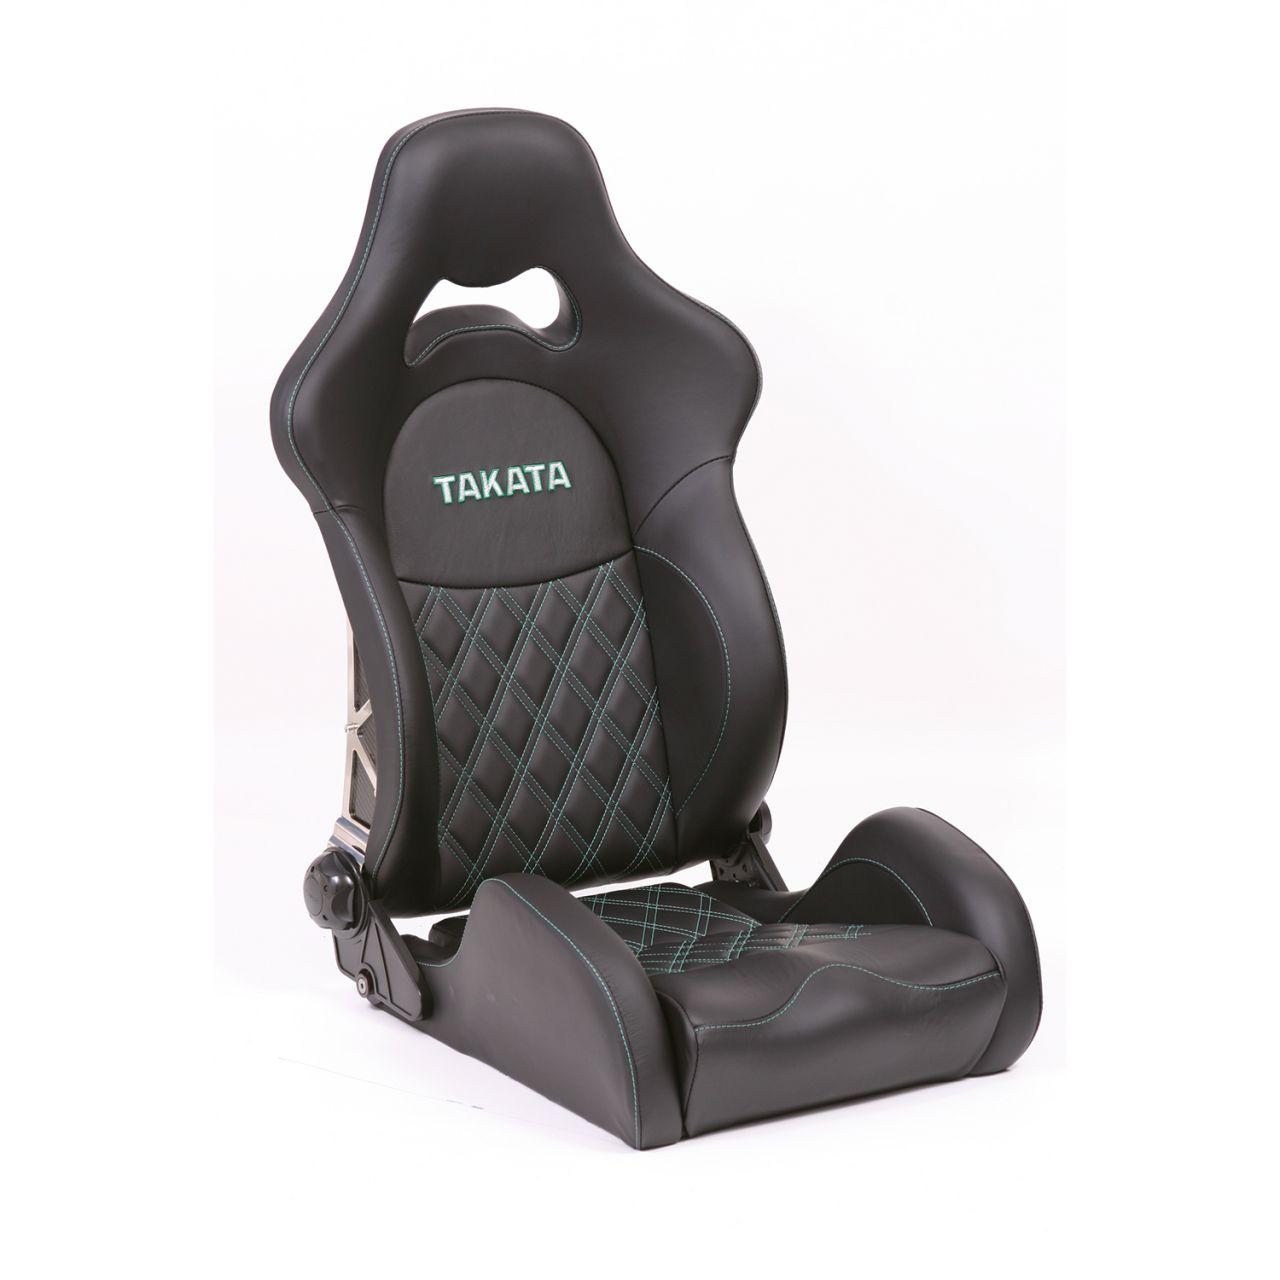 Takata Drift Pro LE Reclining Sport Seat - GSM Sport Seats